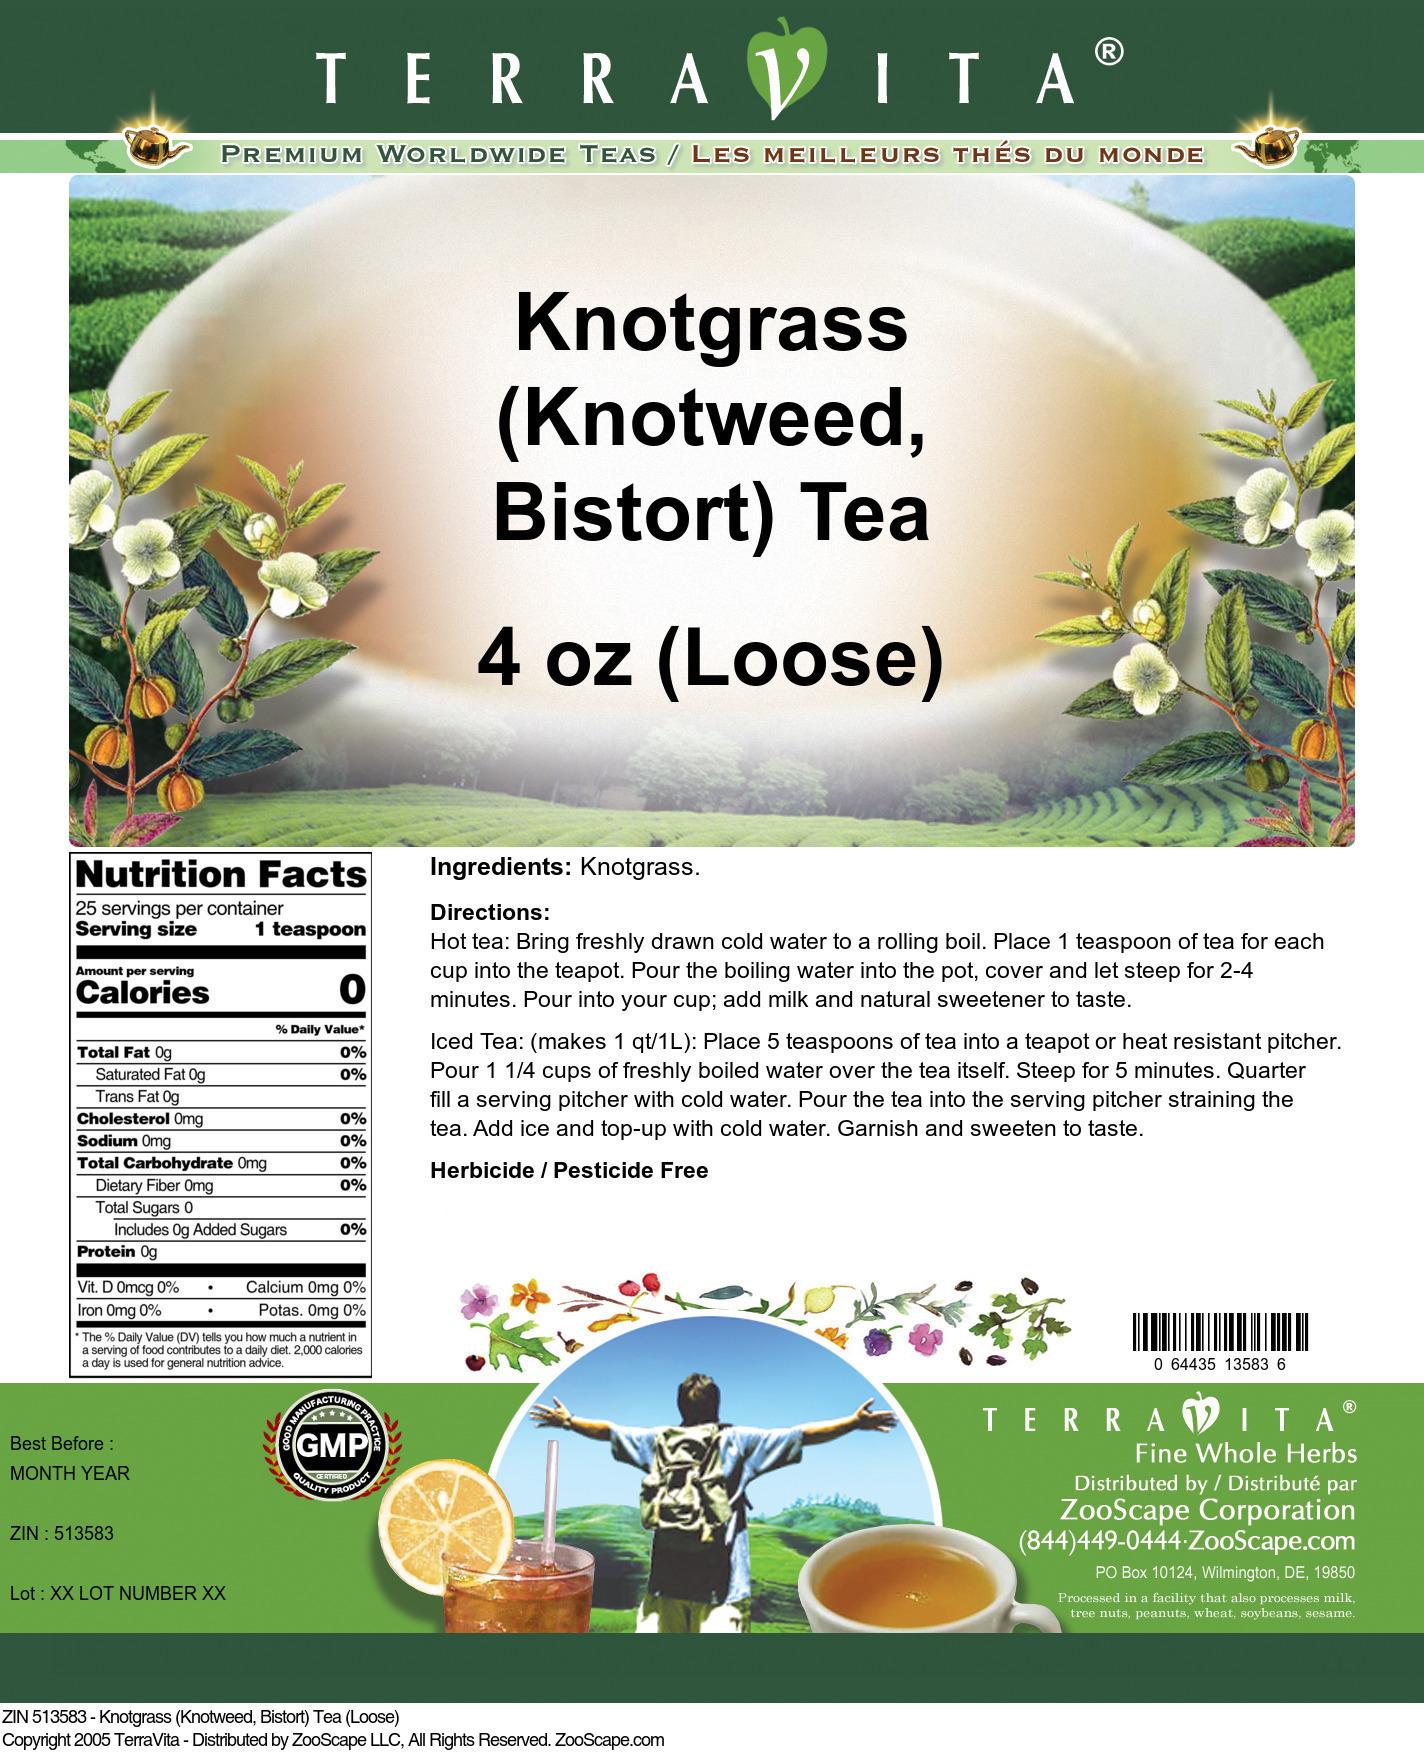 Knotgrass (Knotweed, Bistort) Tea (Loose)